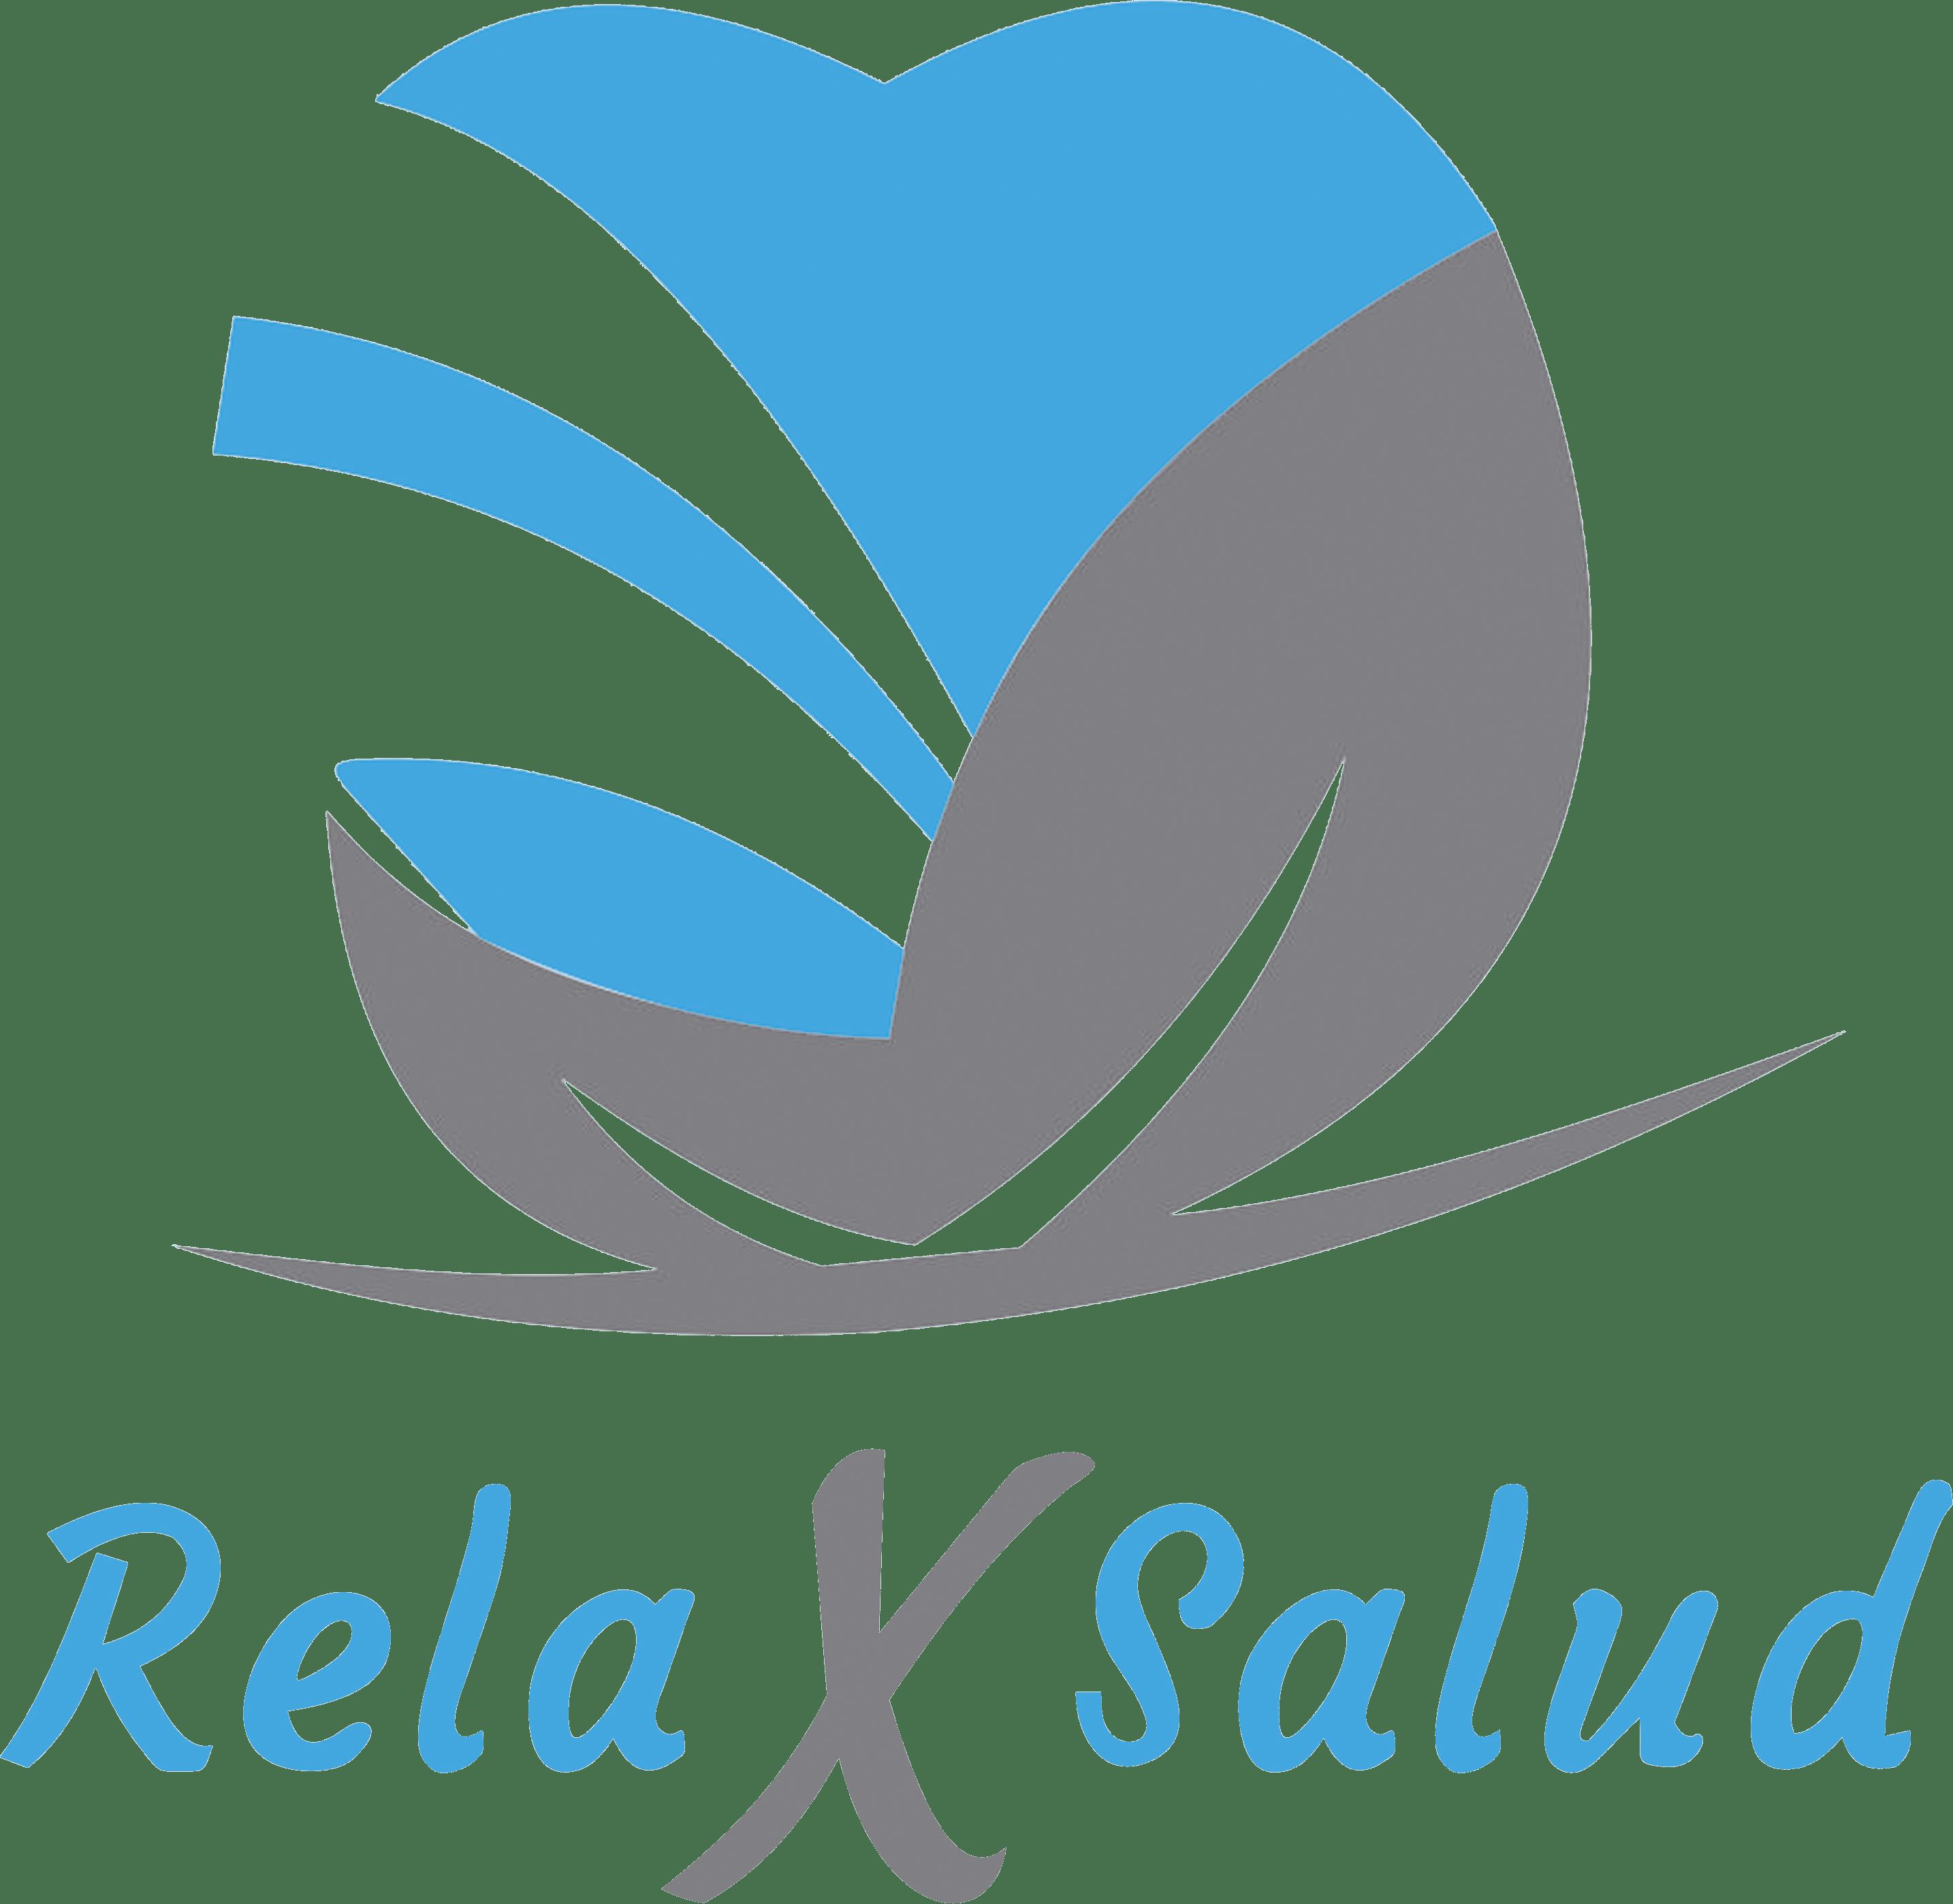 RelaxSalud